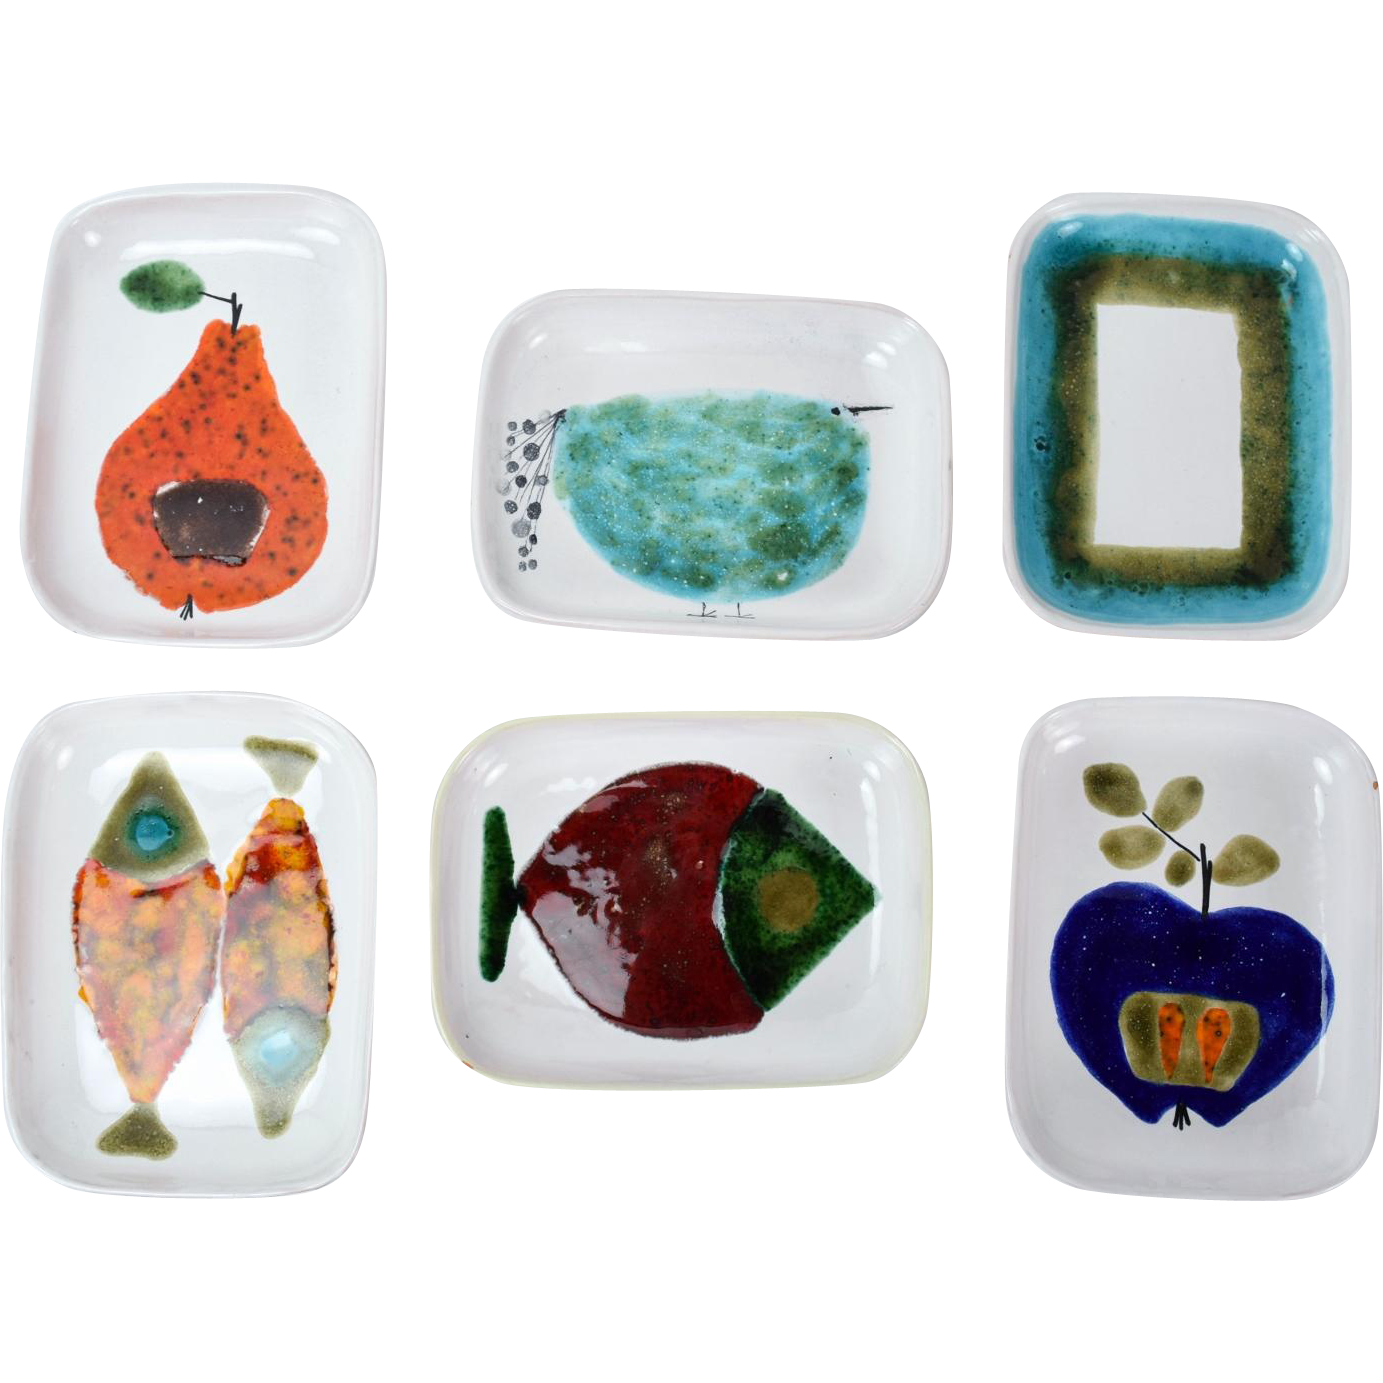 Mid-Century Modern Abstracted Fruit & Animals Ursula Schneider Atelier Rabiusla